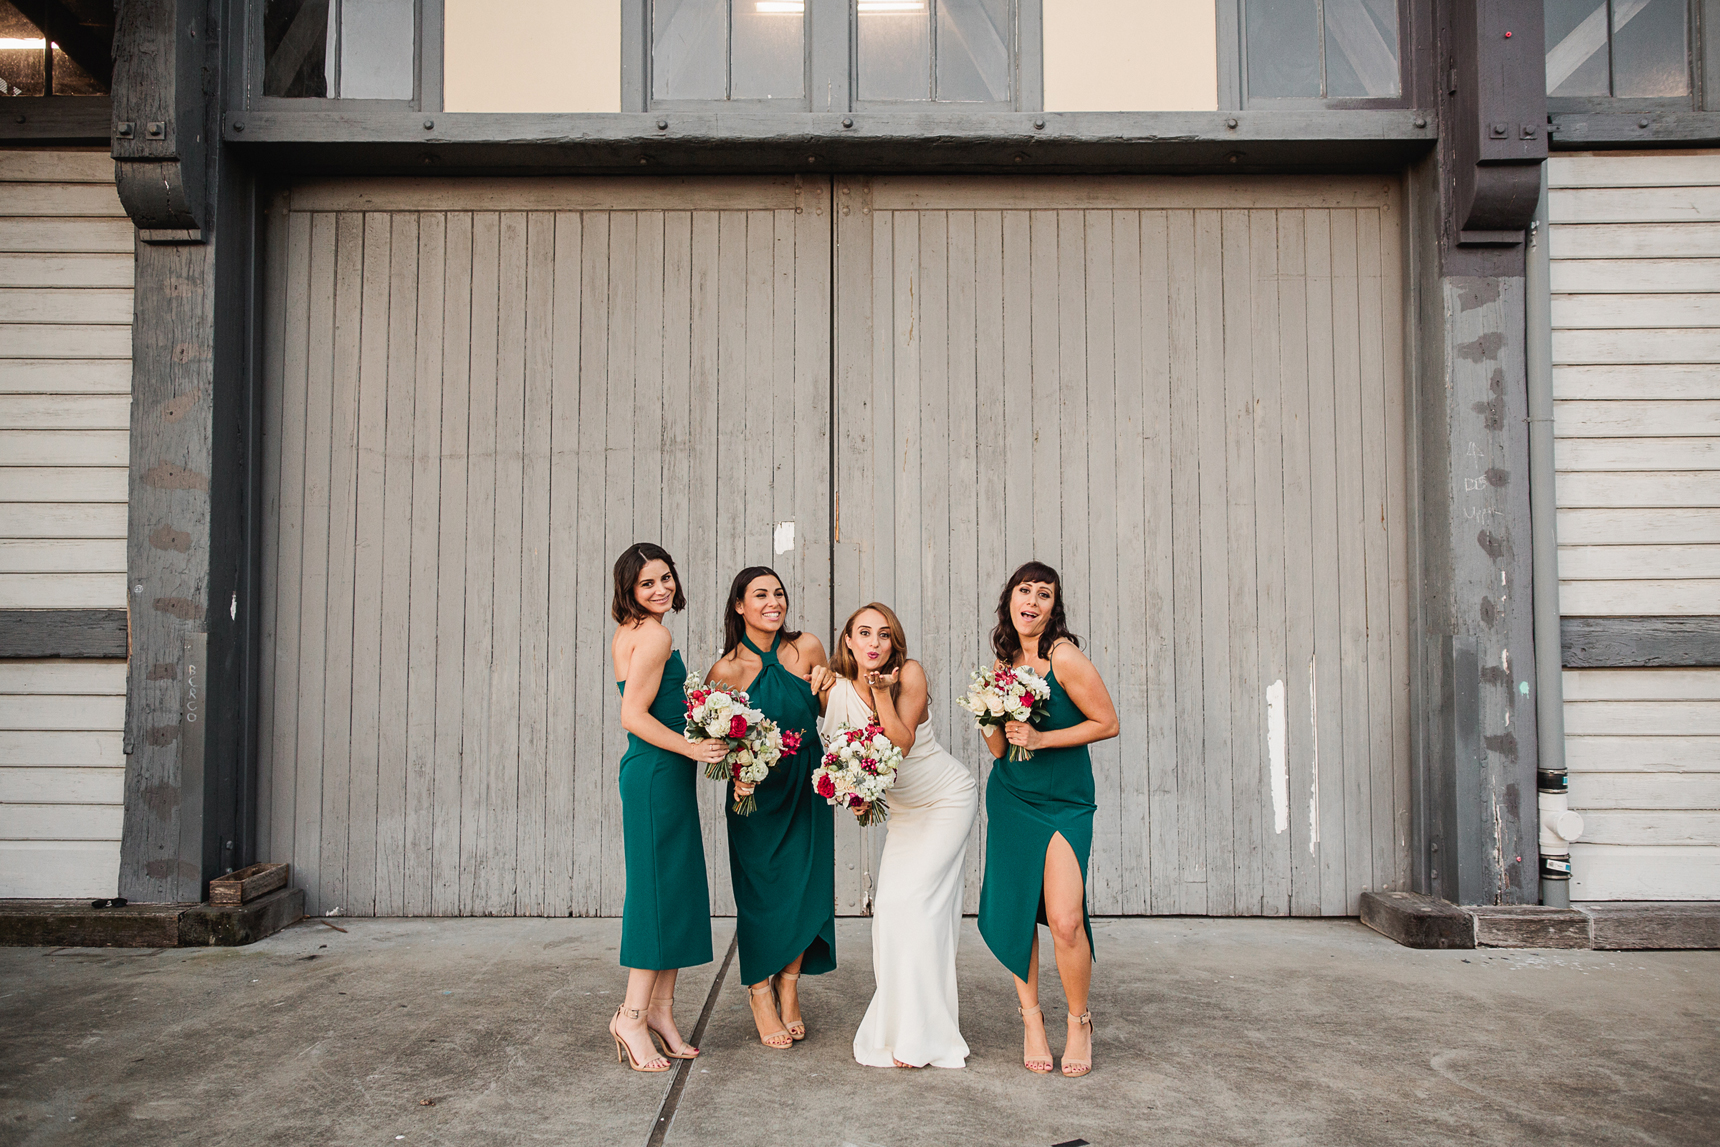 GregLana_ViewBySydney_WeddingPhotography060.jpg